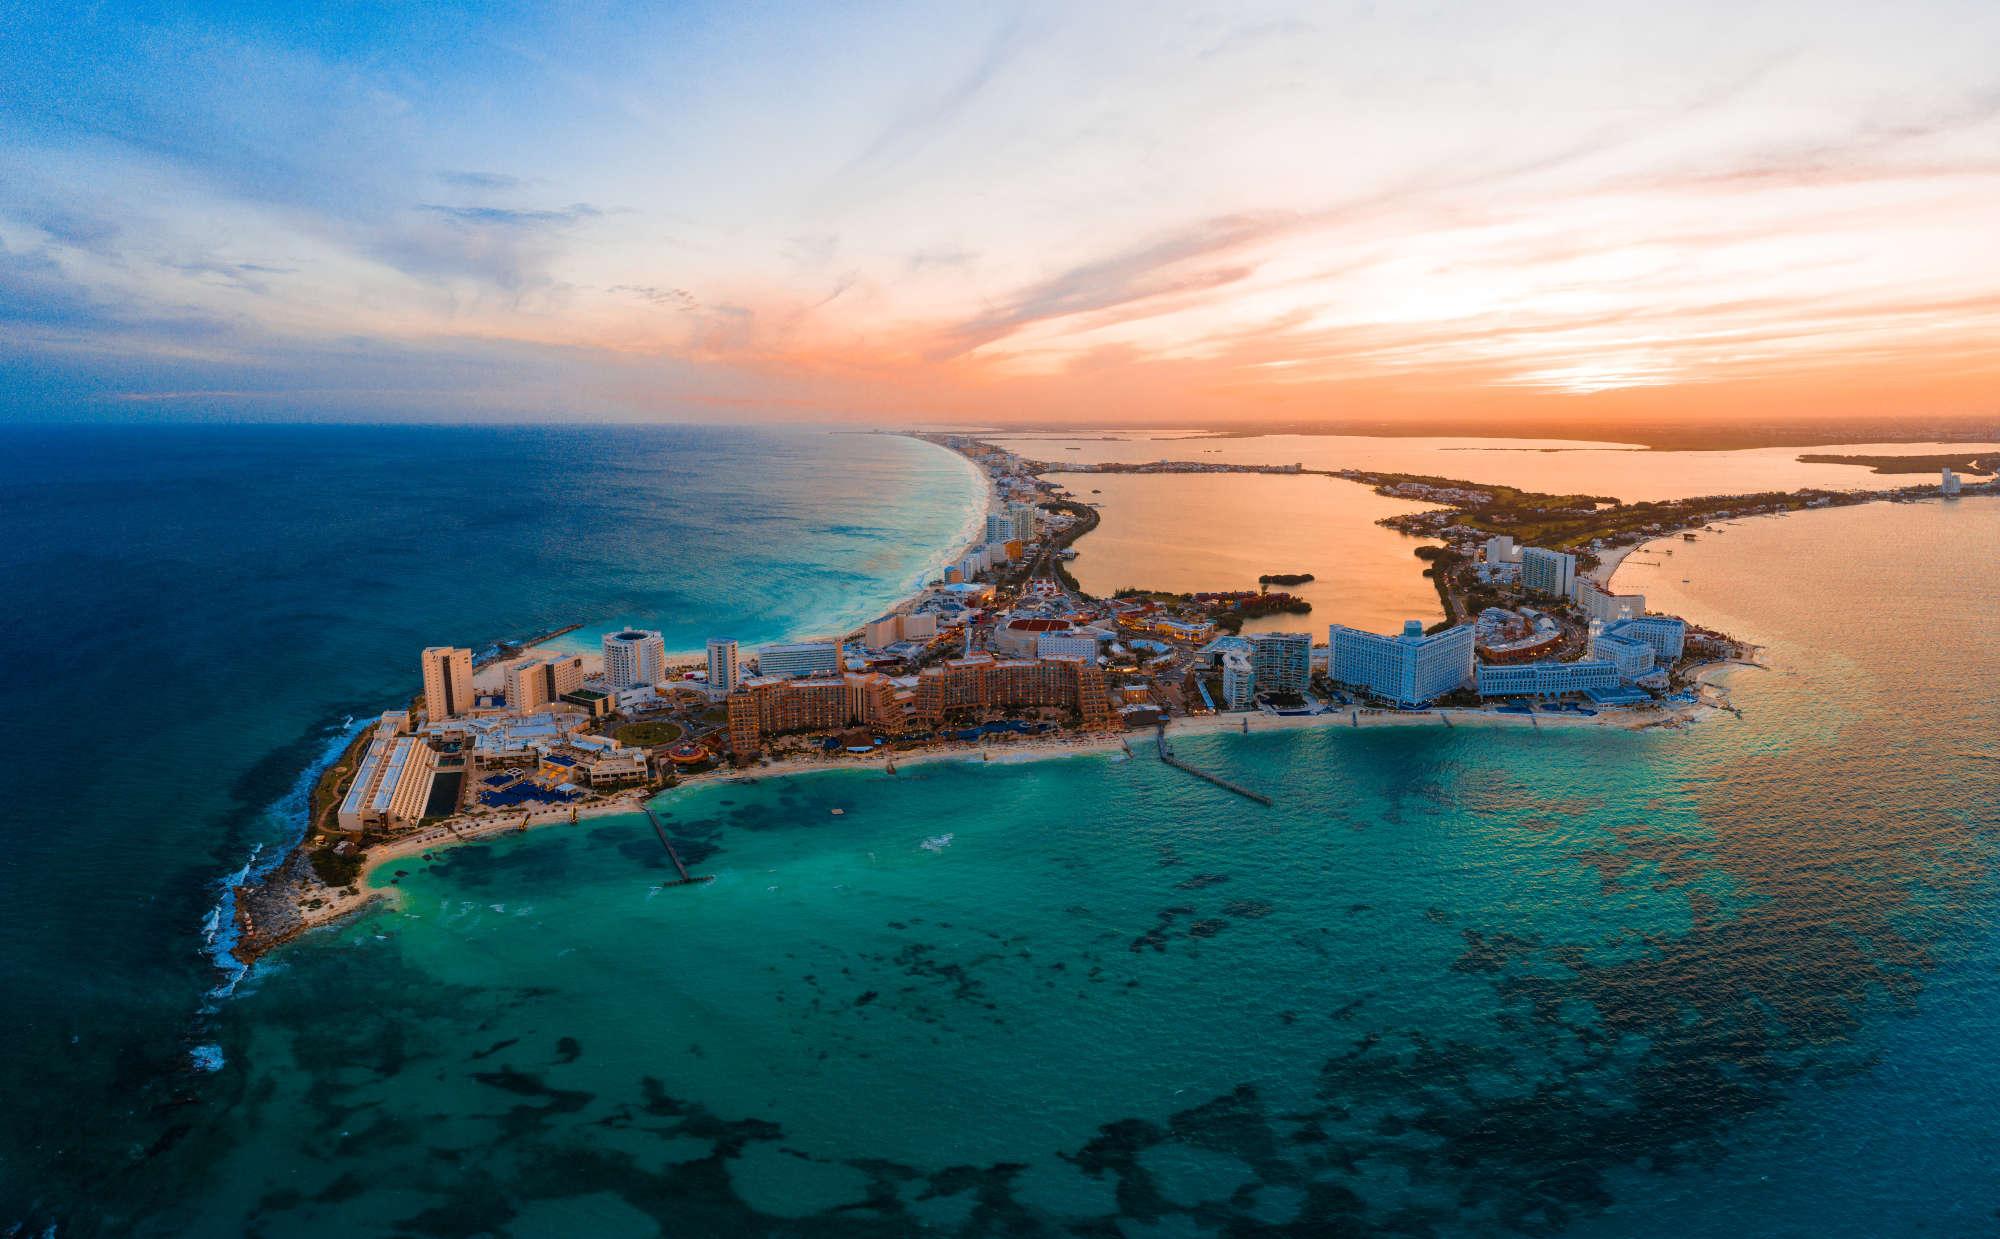 Cancún Mexico beach sunset aerial